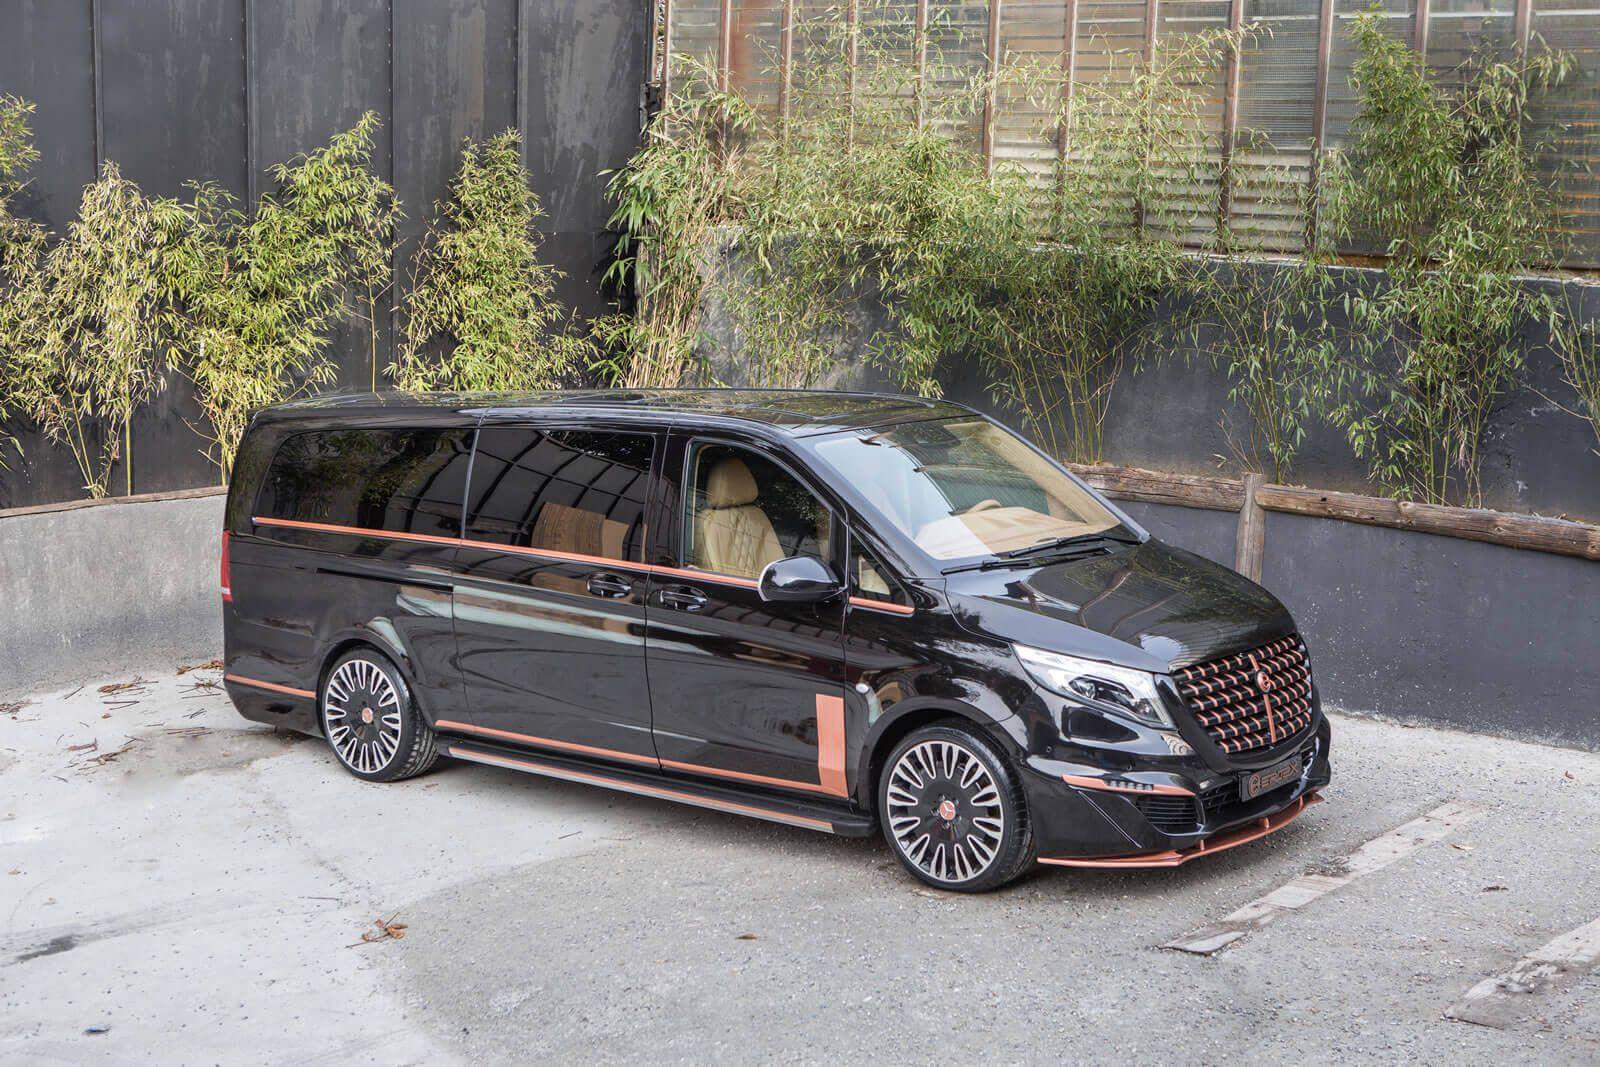 Ertex Luxury Car Design Westfalia Jules Verne Kepler Club